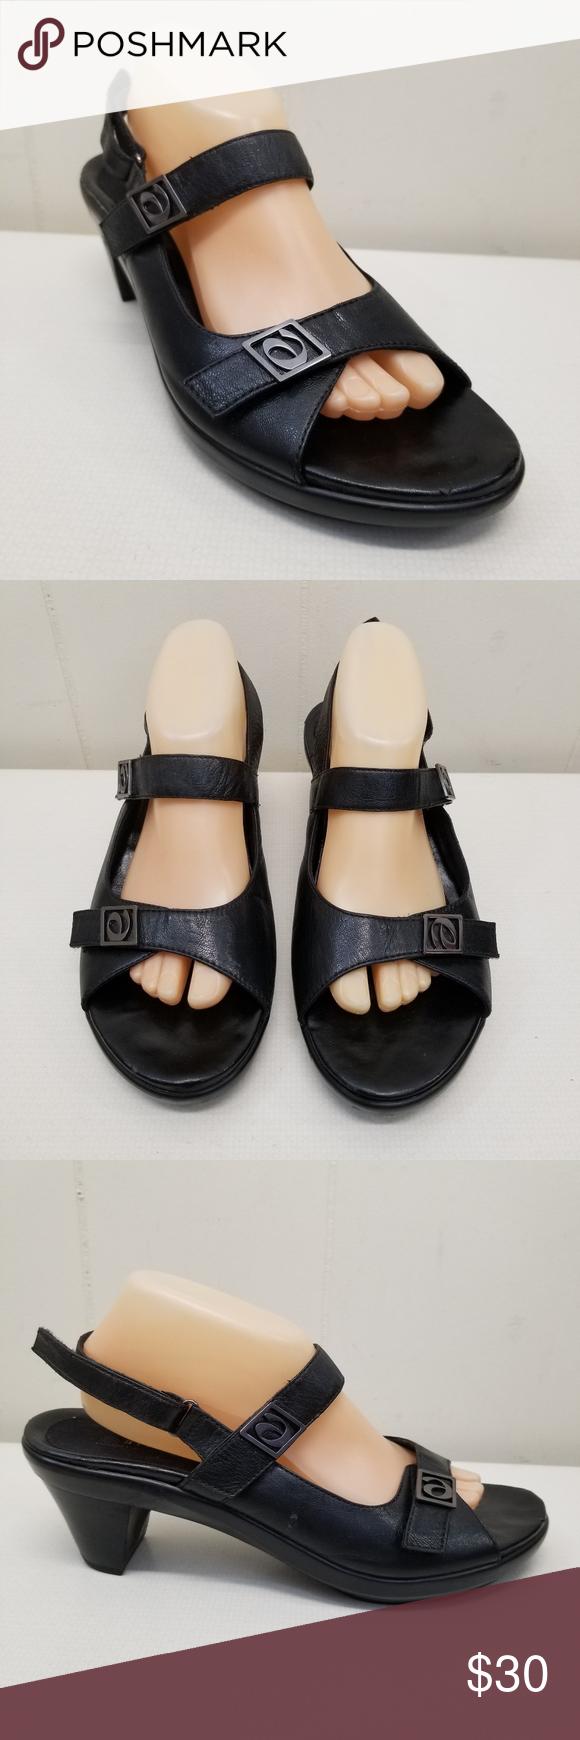 Balance Black Sandals 11B Leather